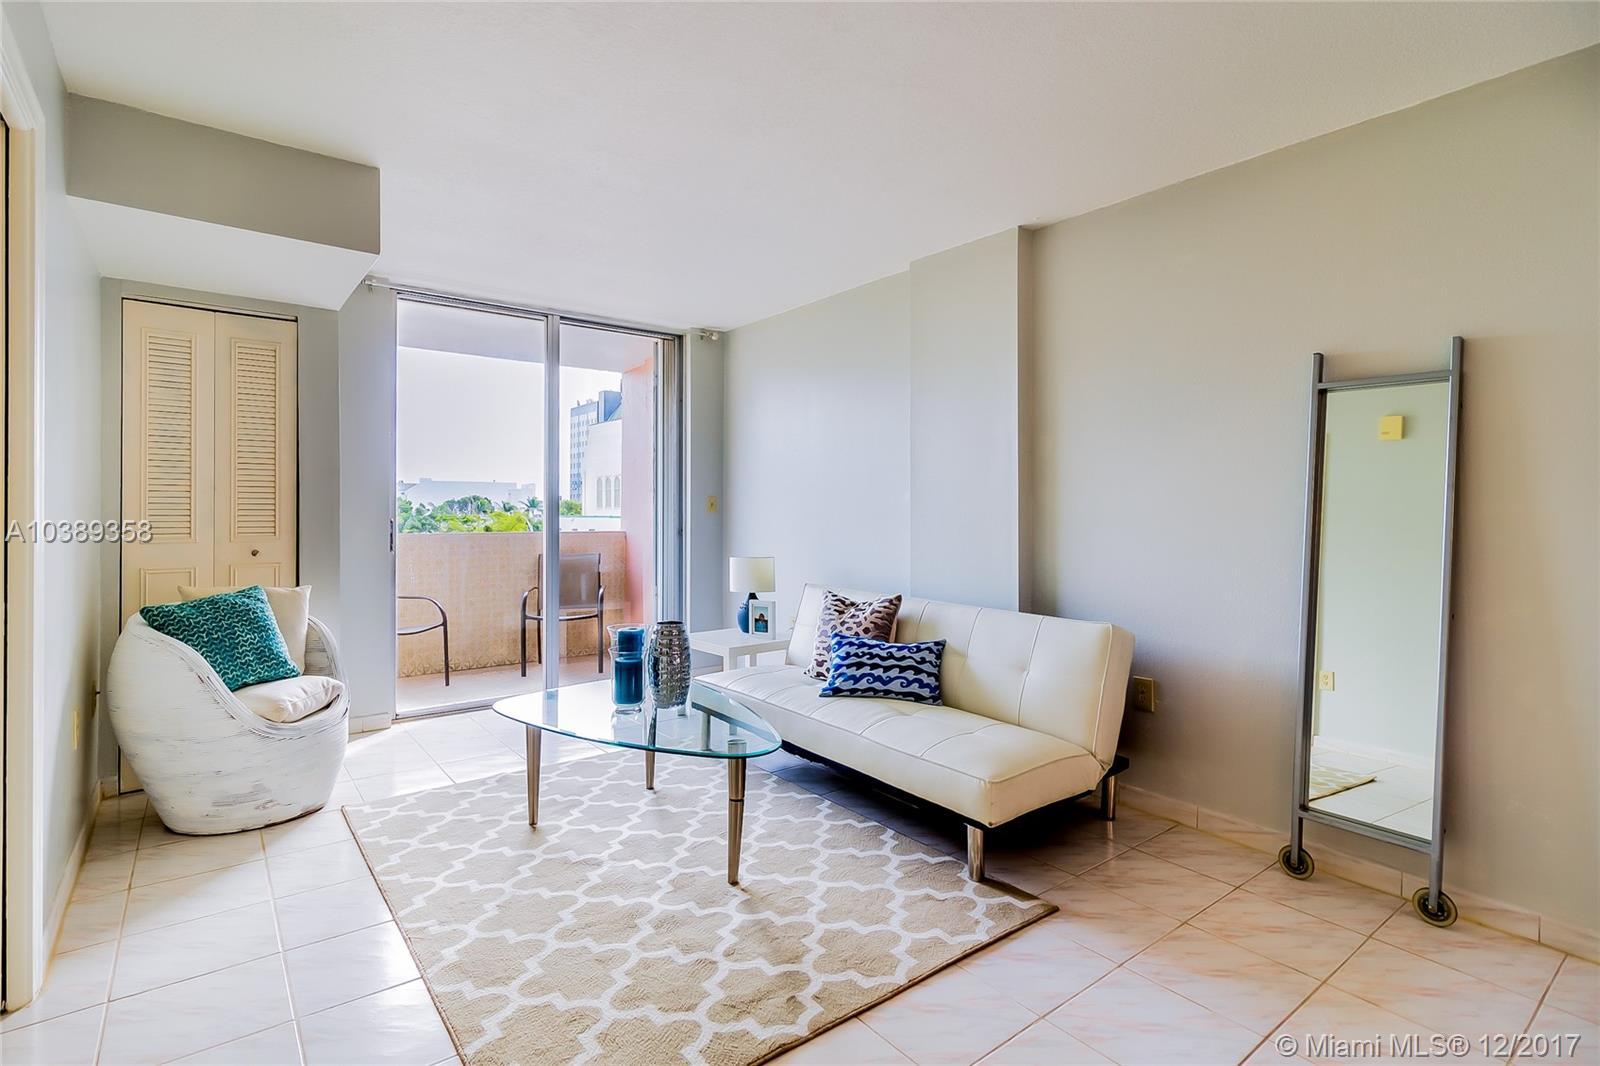 1750 James Ave #5C, Miami Beach, FL 33139 - MLS A10389358 - Coldwell ...